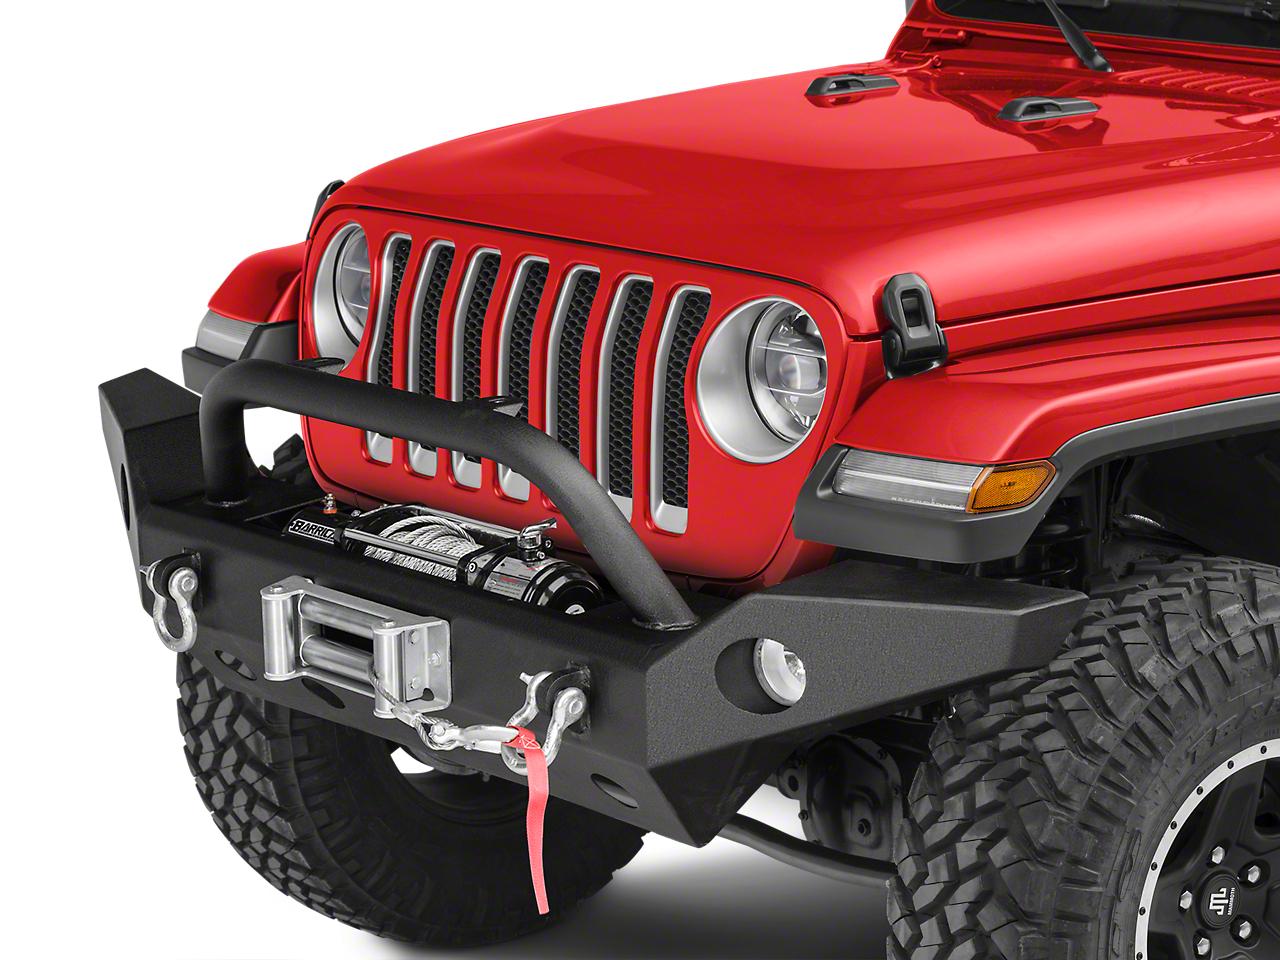 Barricade Trail Force HD Full Width Front Bumper & 9,500 lb. Winch Combo (2018 Jeep Wrangler JL)